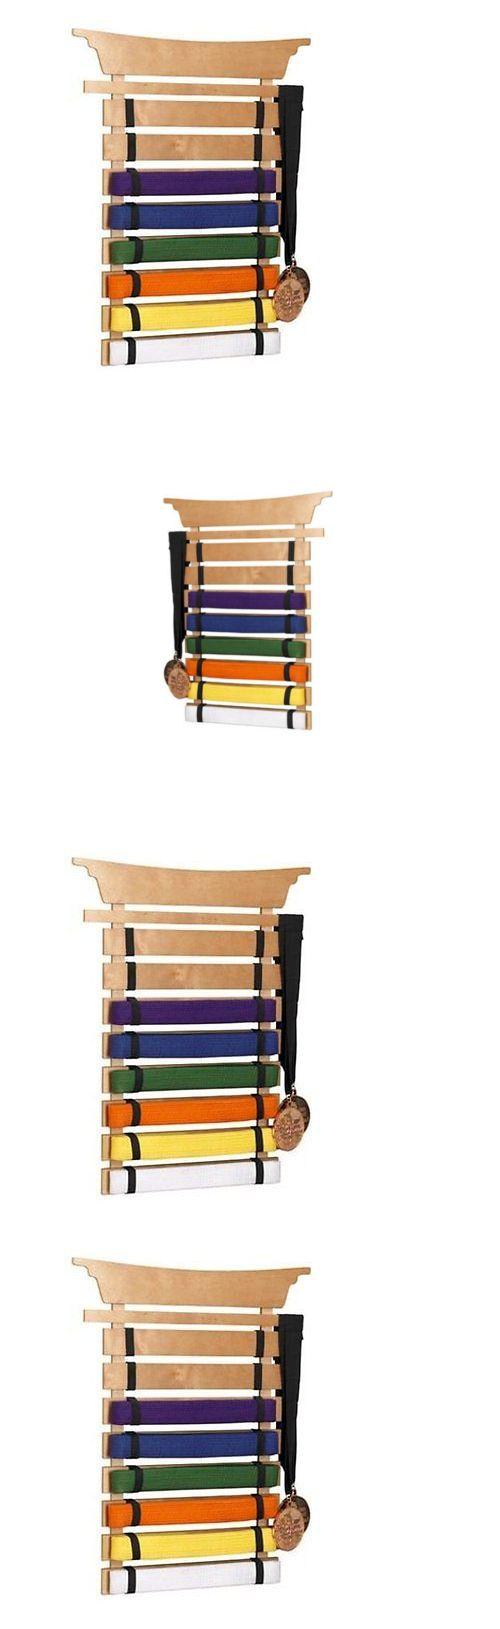 Karate belt display ideas - Belt Displays 179768 Karate Martial Arts Belts Holder Judo Rack Wall Display Kung Fu Organize